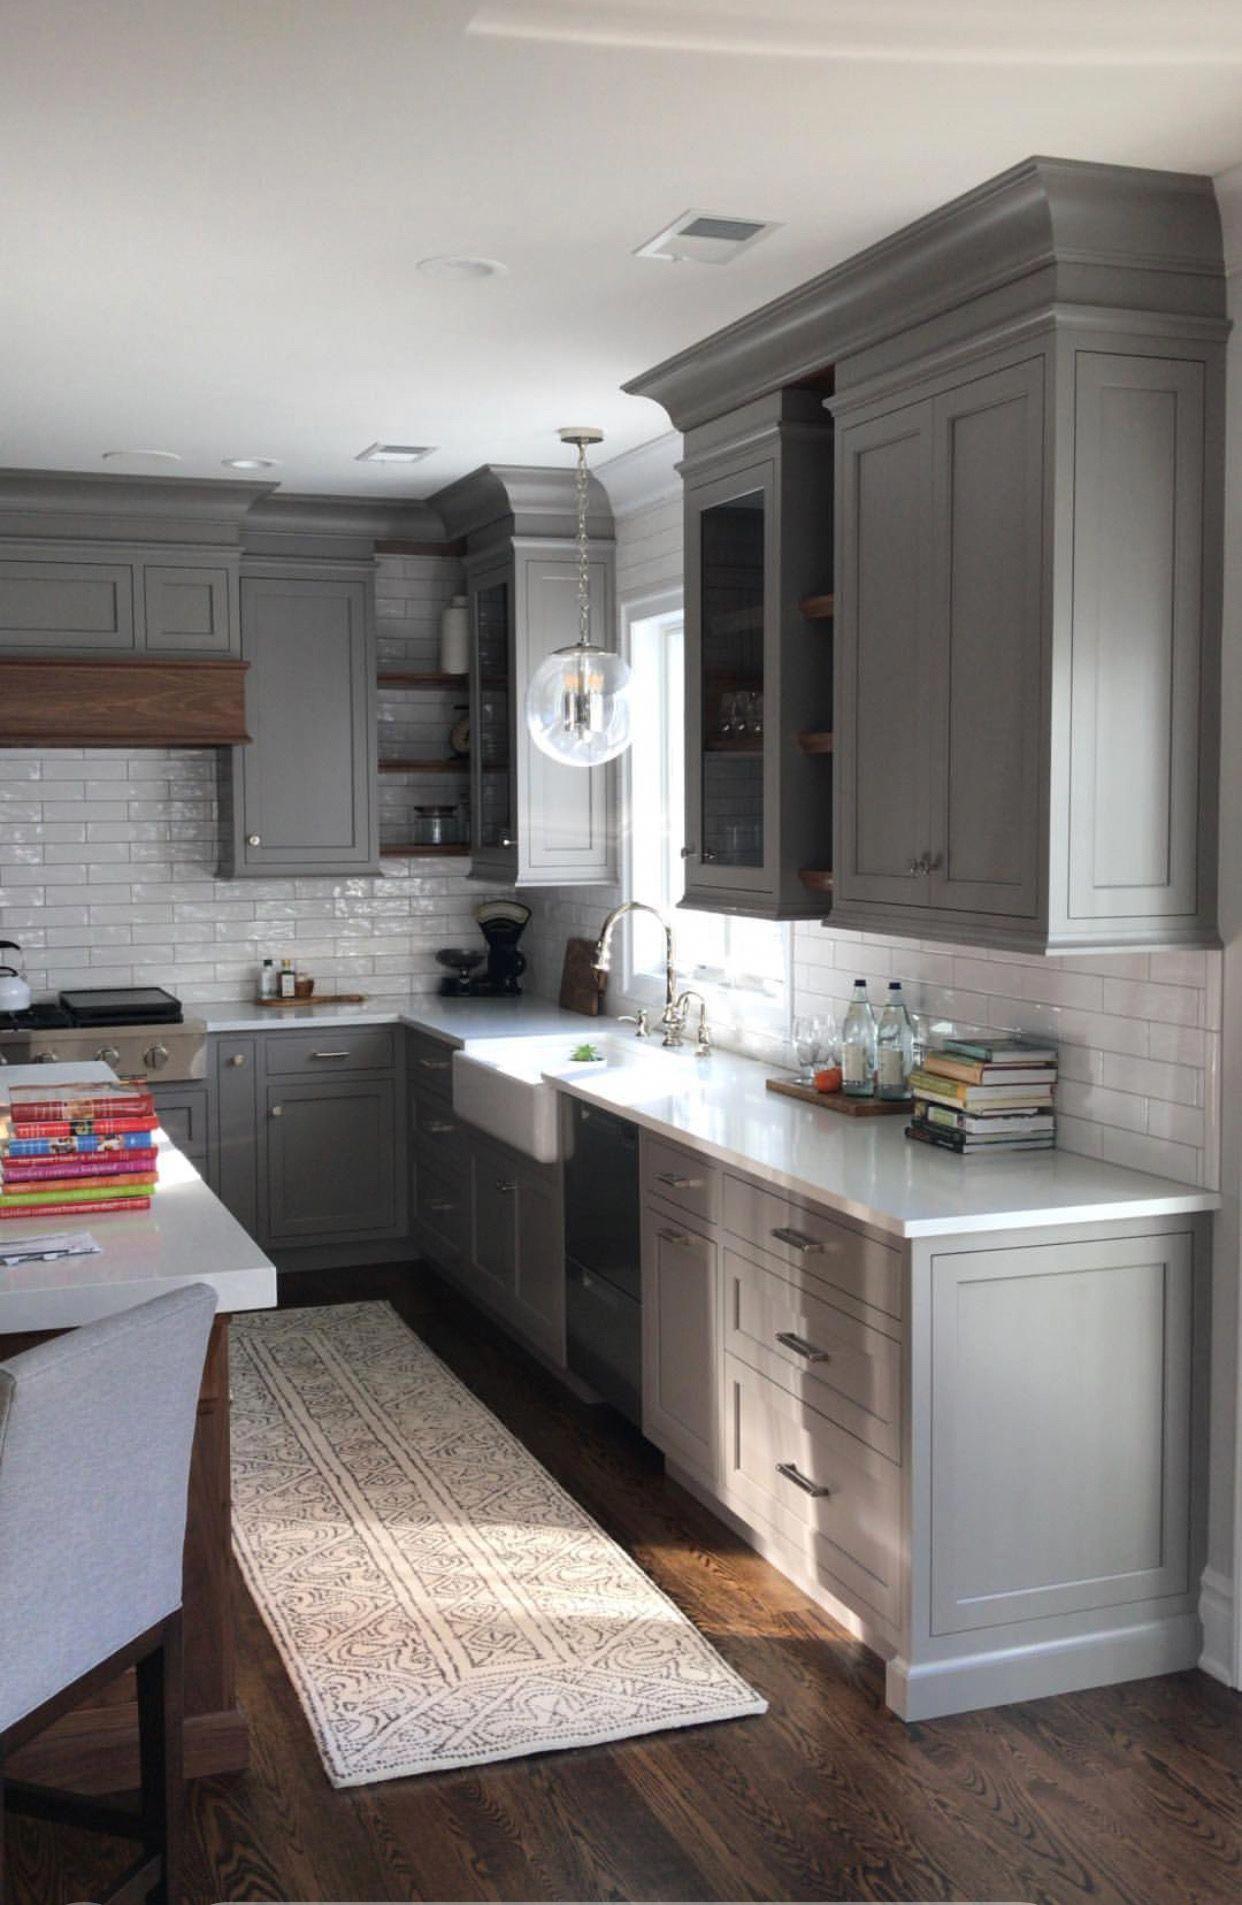 Passage Carpet Runners Johannesburg Carpetrunnersnortheast Code 7451977409 Home Decor Kitchen Kitchen Remodel Kitchen Cabinet Design